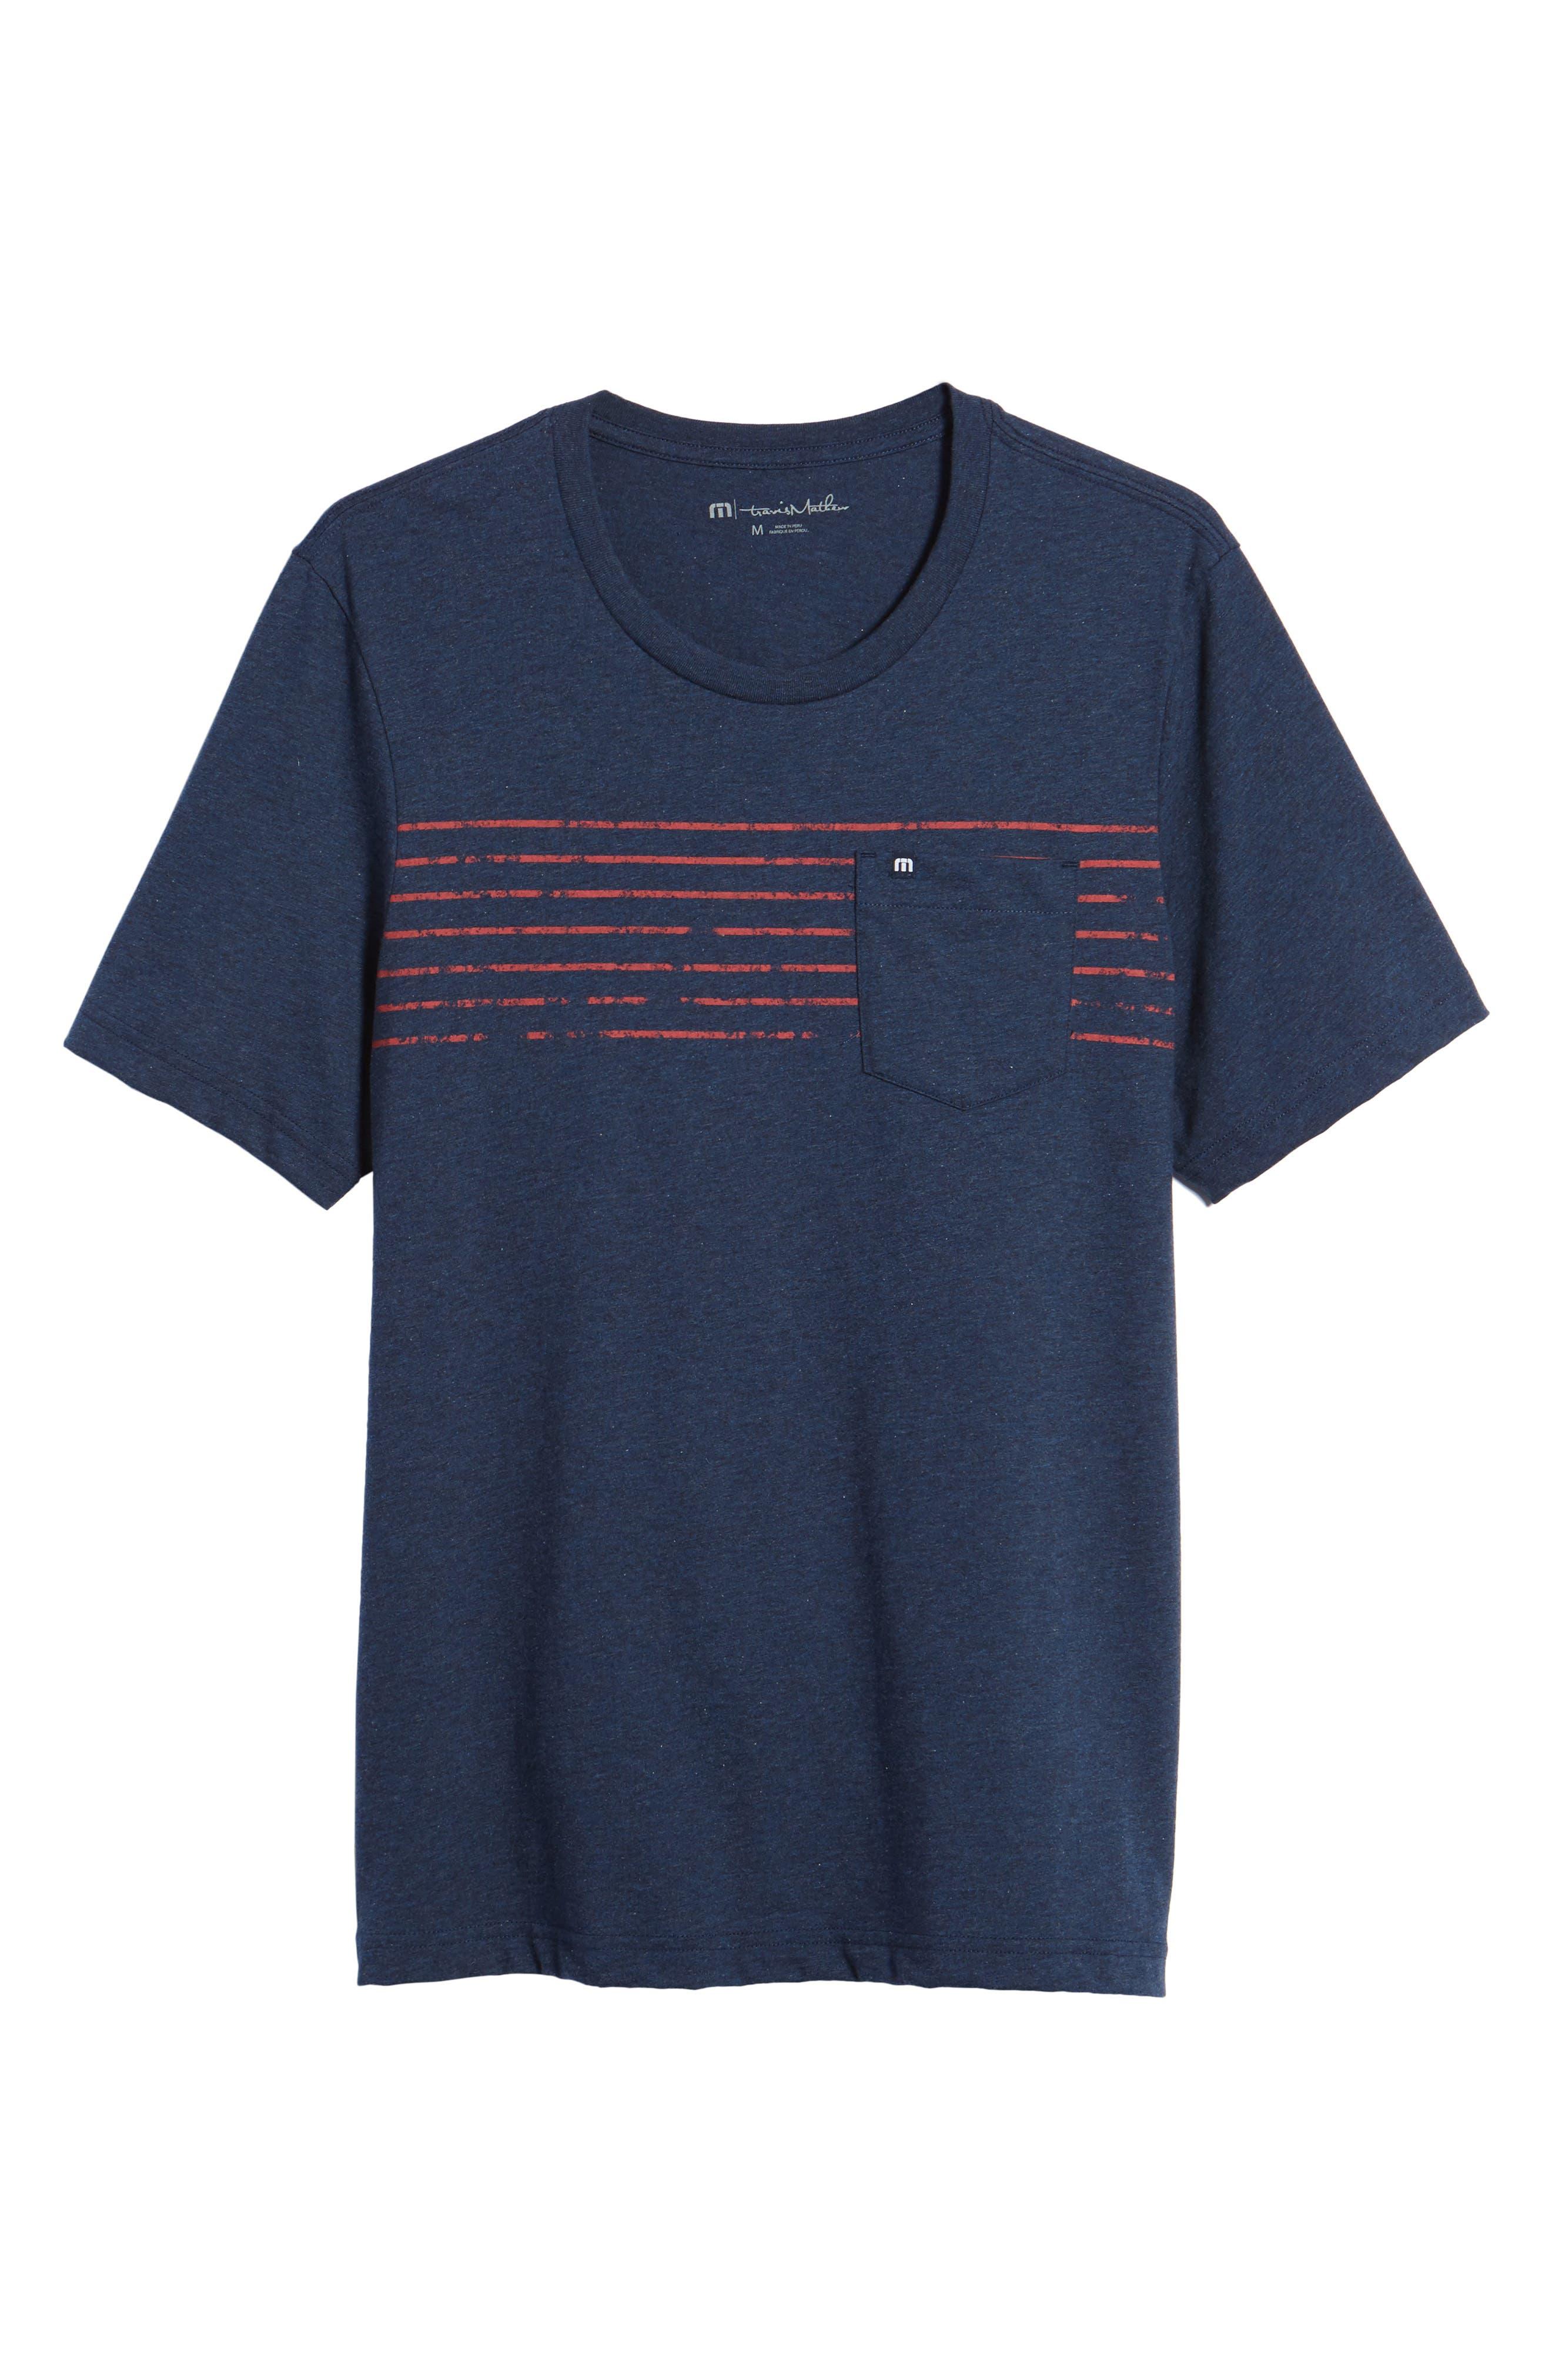 Bogue Pocket T-Shirt,                             Alternate thumbnail 6, color,                             Heather Blue Nights